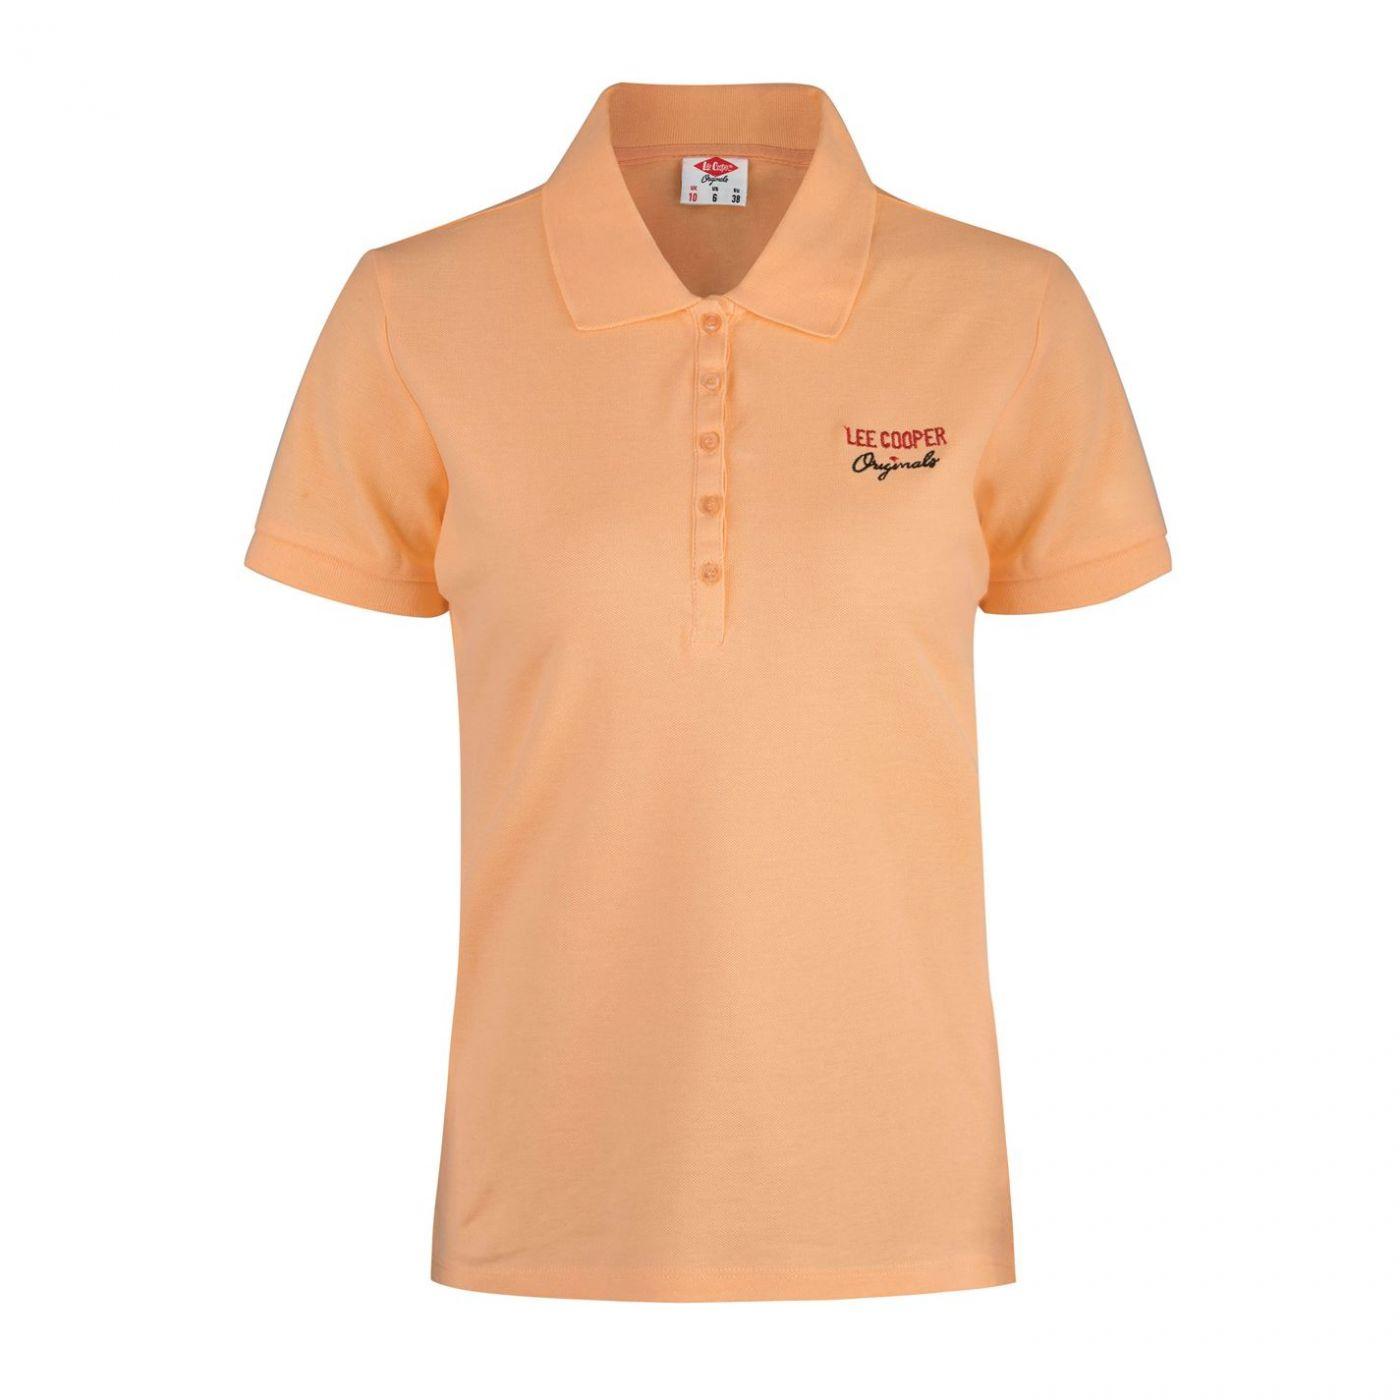 Lee Cooper Plain Polo Shirt Ladies